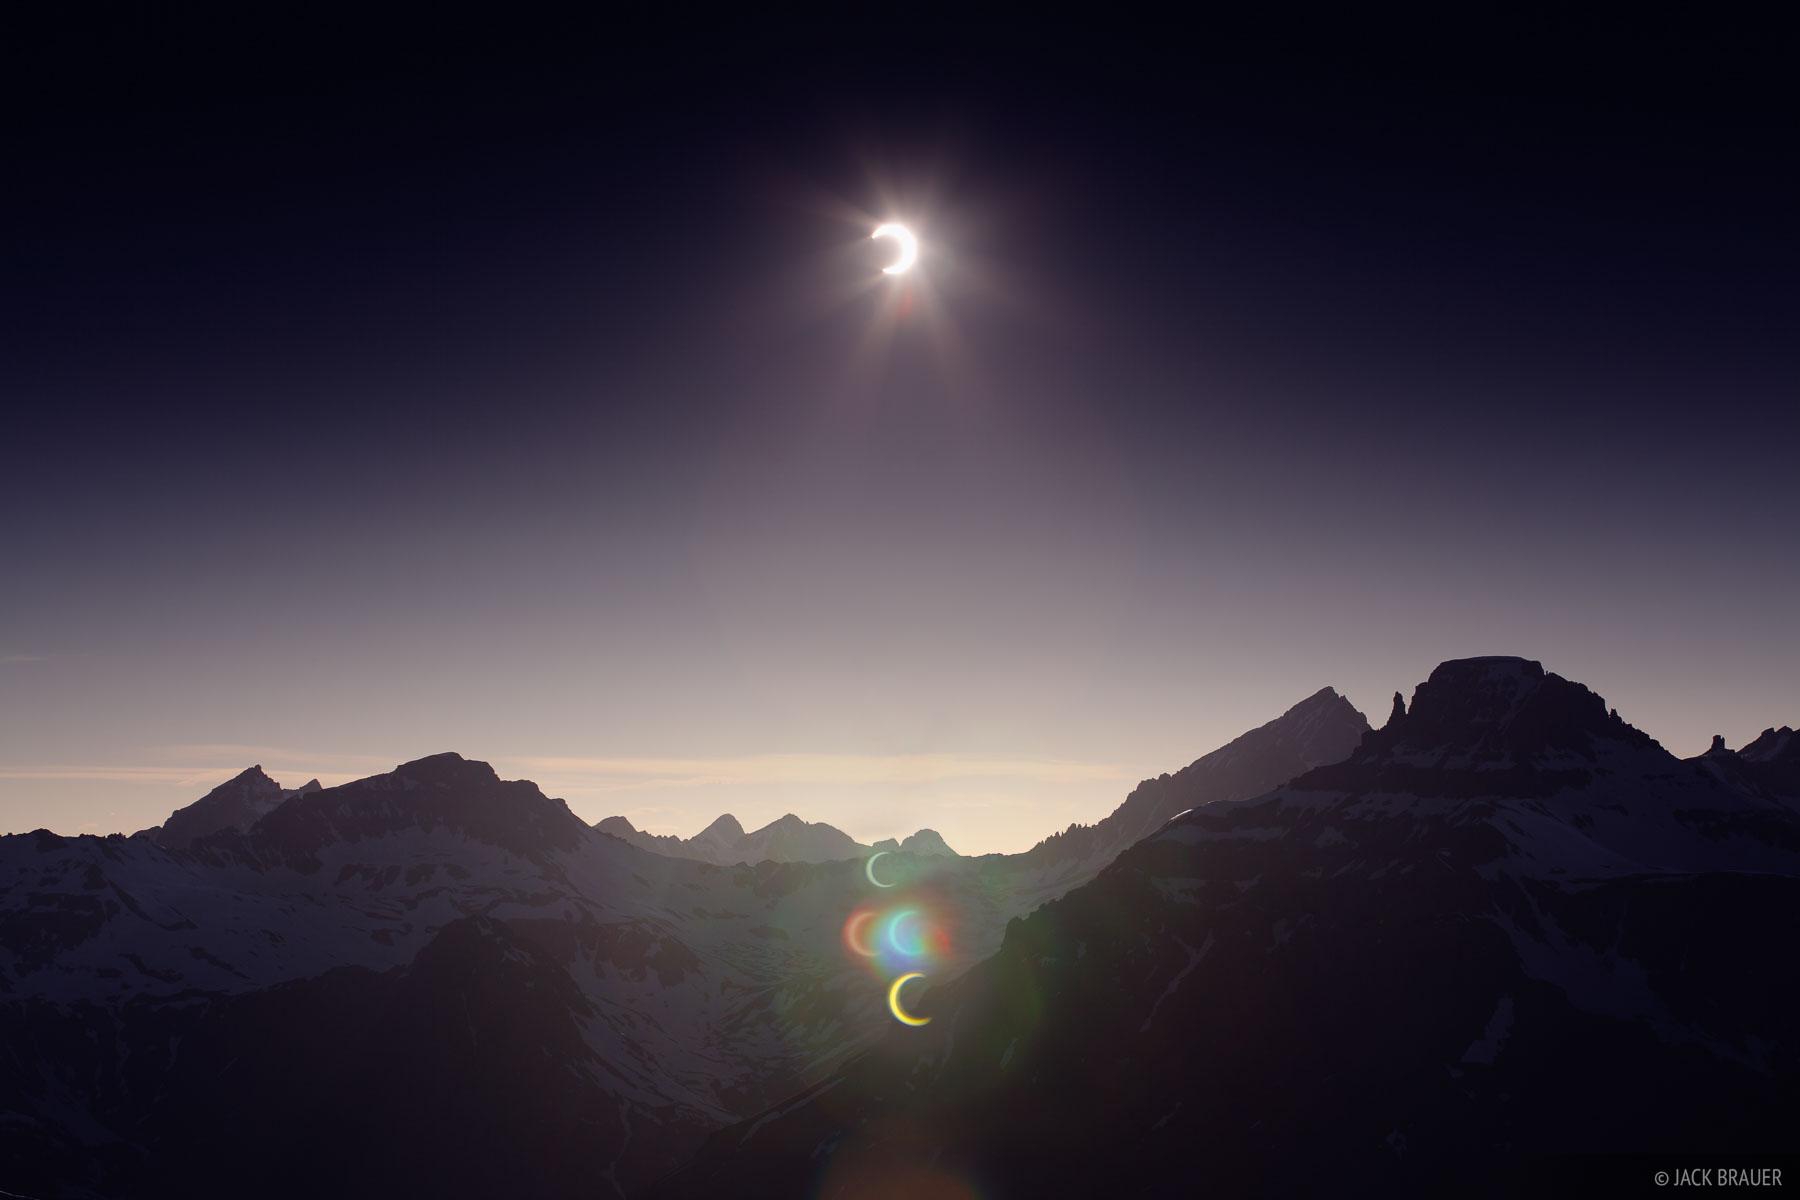 solar eclipse, Mt. Sneffels, San Juan Mountains, Colorado, photo